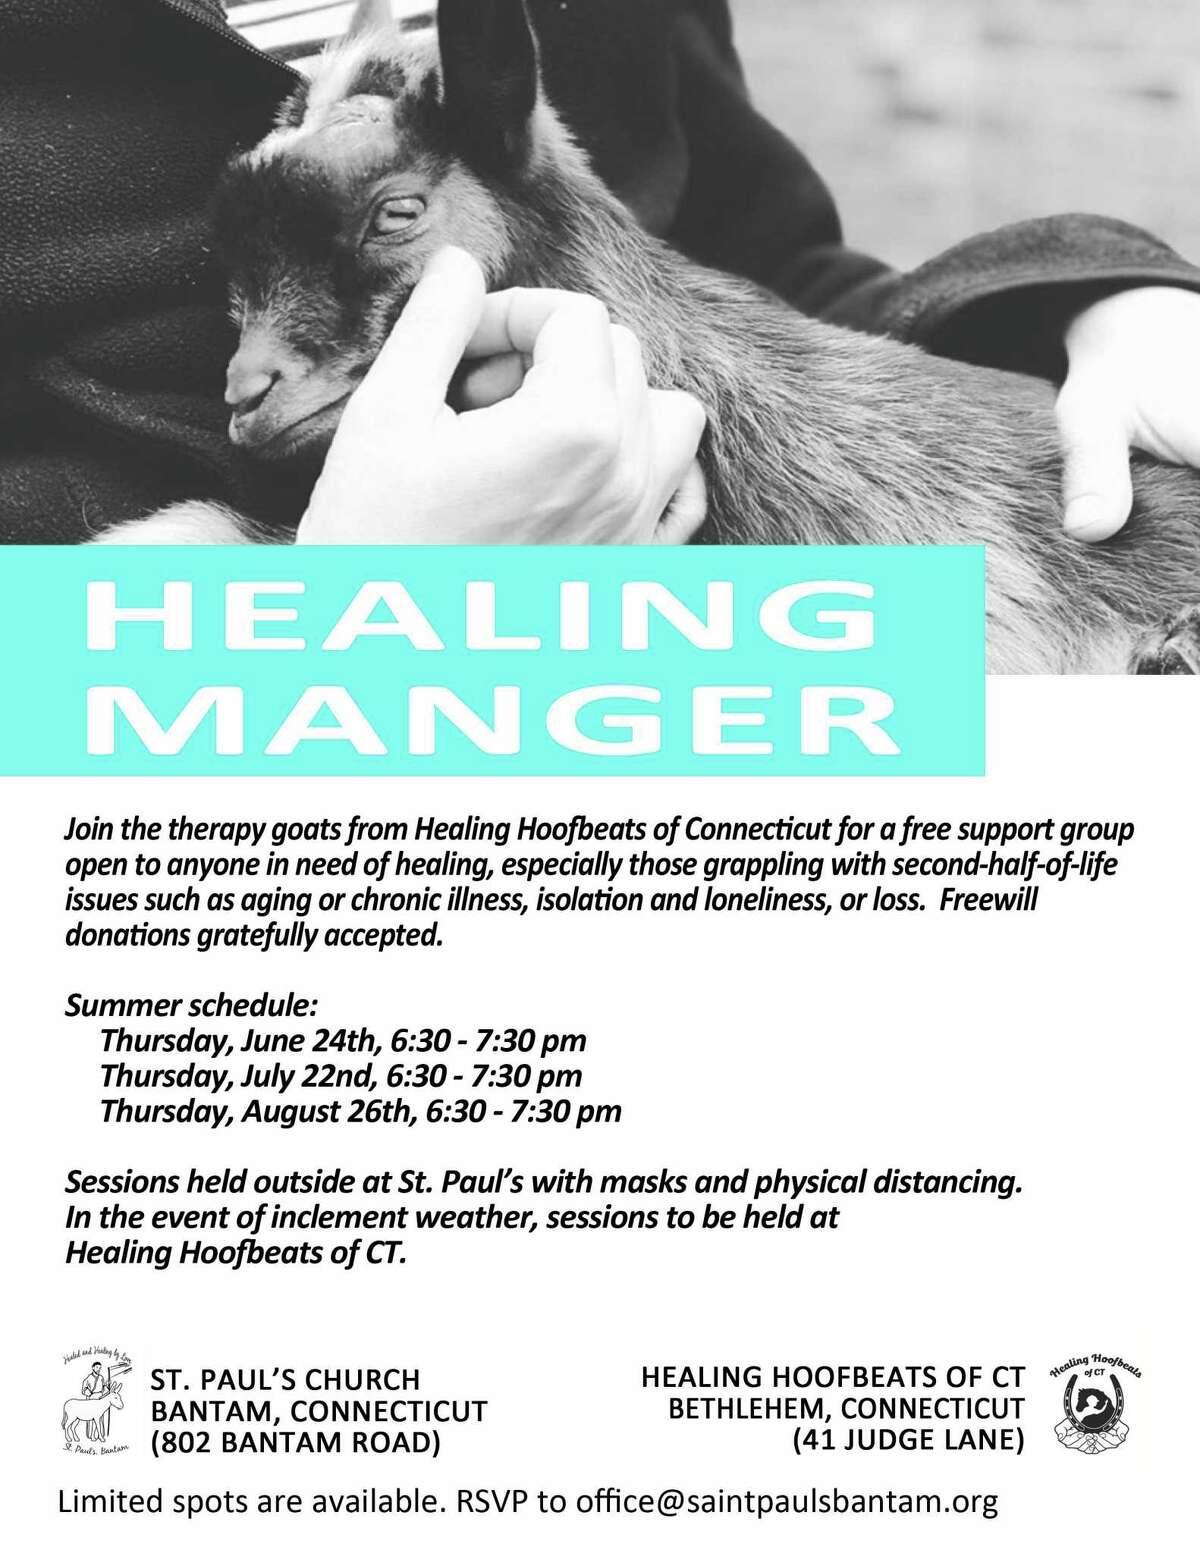 Healing Hoofbeat goats will visit St. Paul's Church in Bantam this summer.